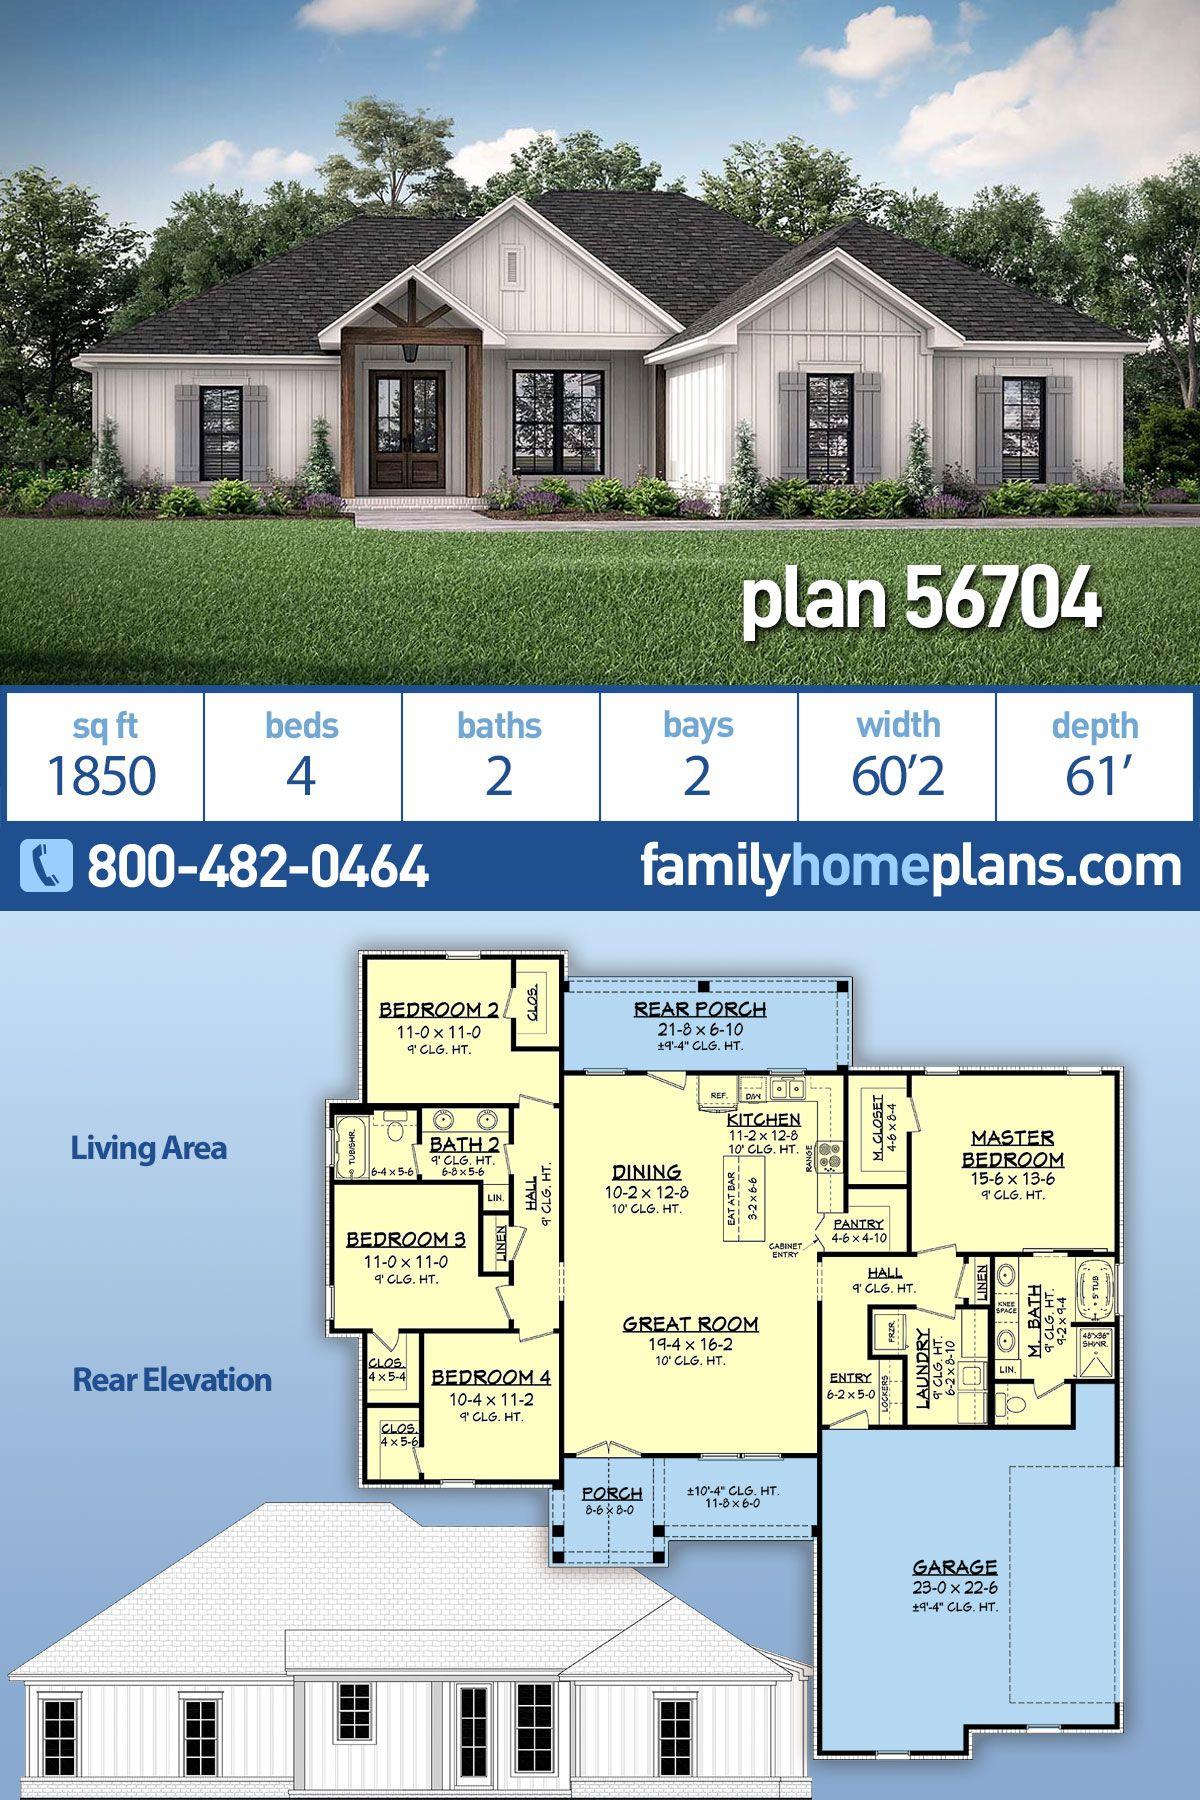 Modern Farmhouse Style House Plan 56704 With 4 Bed 2 Bath 2